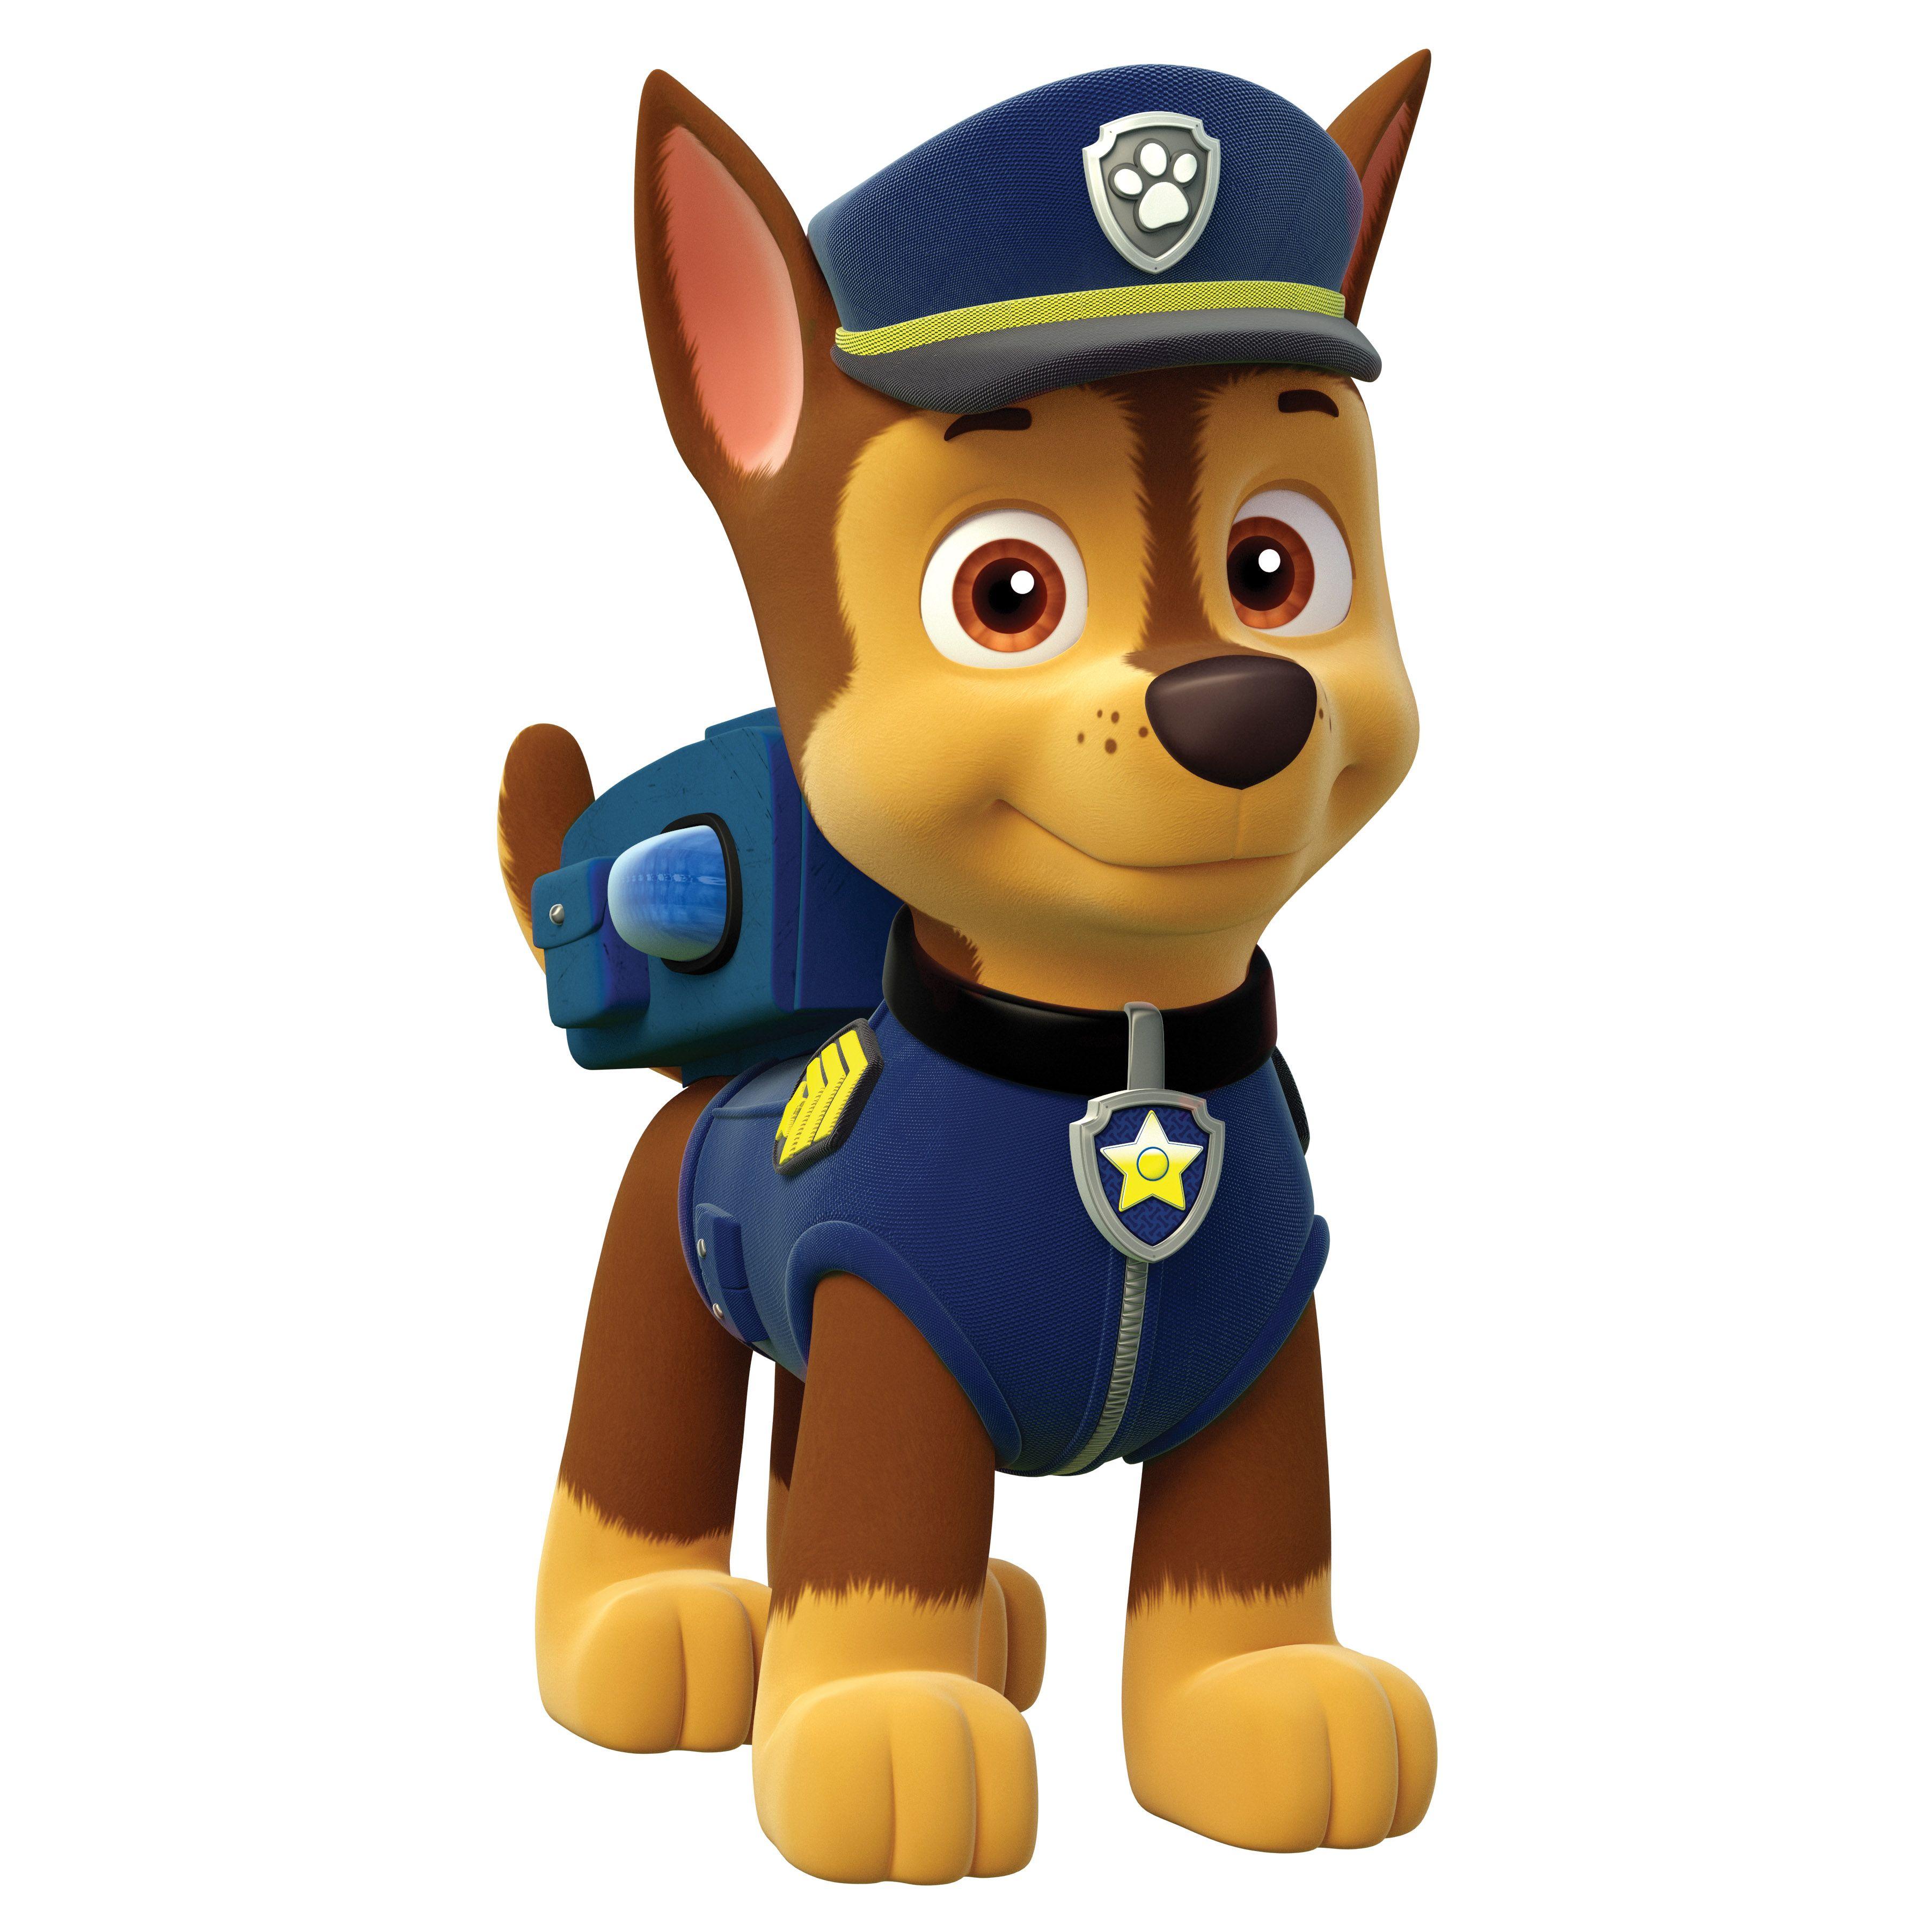 Paw patrol: Chase | Paw Patrol Party | Pinterest